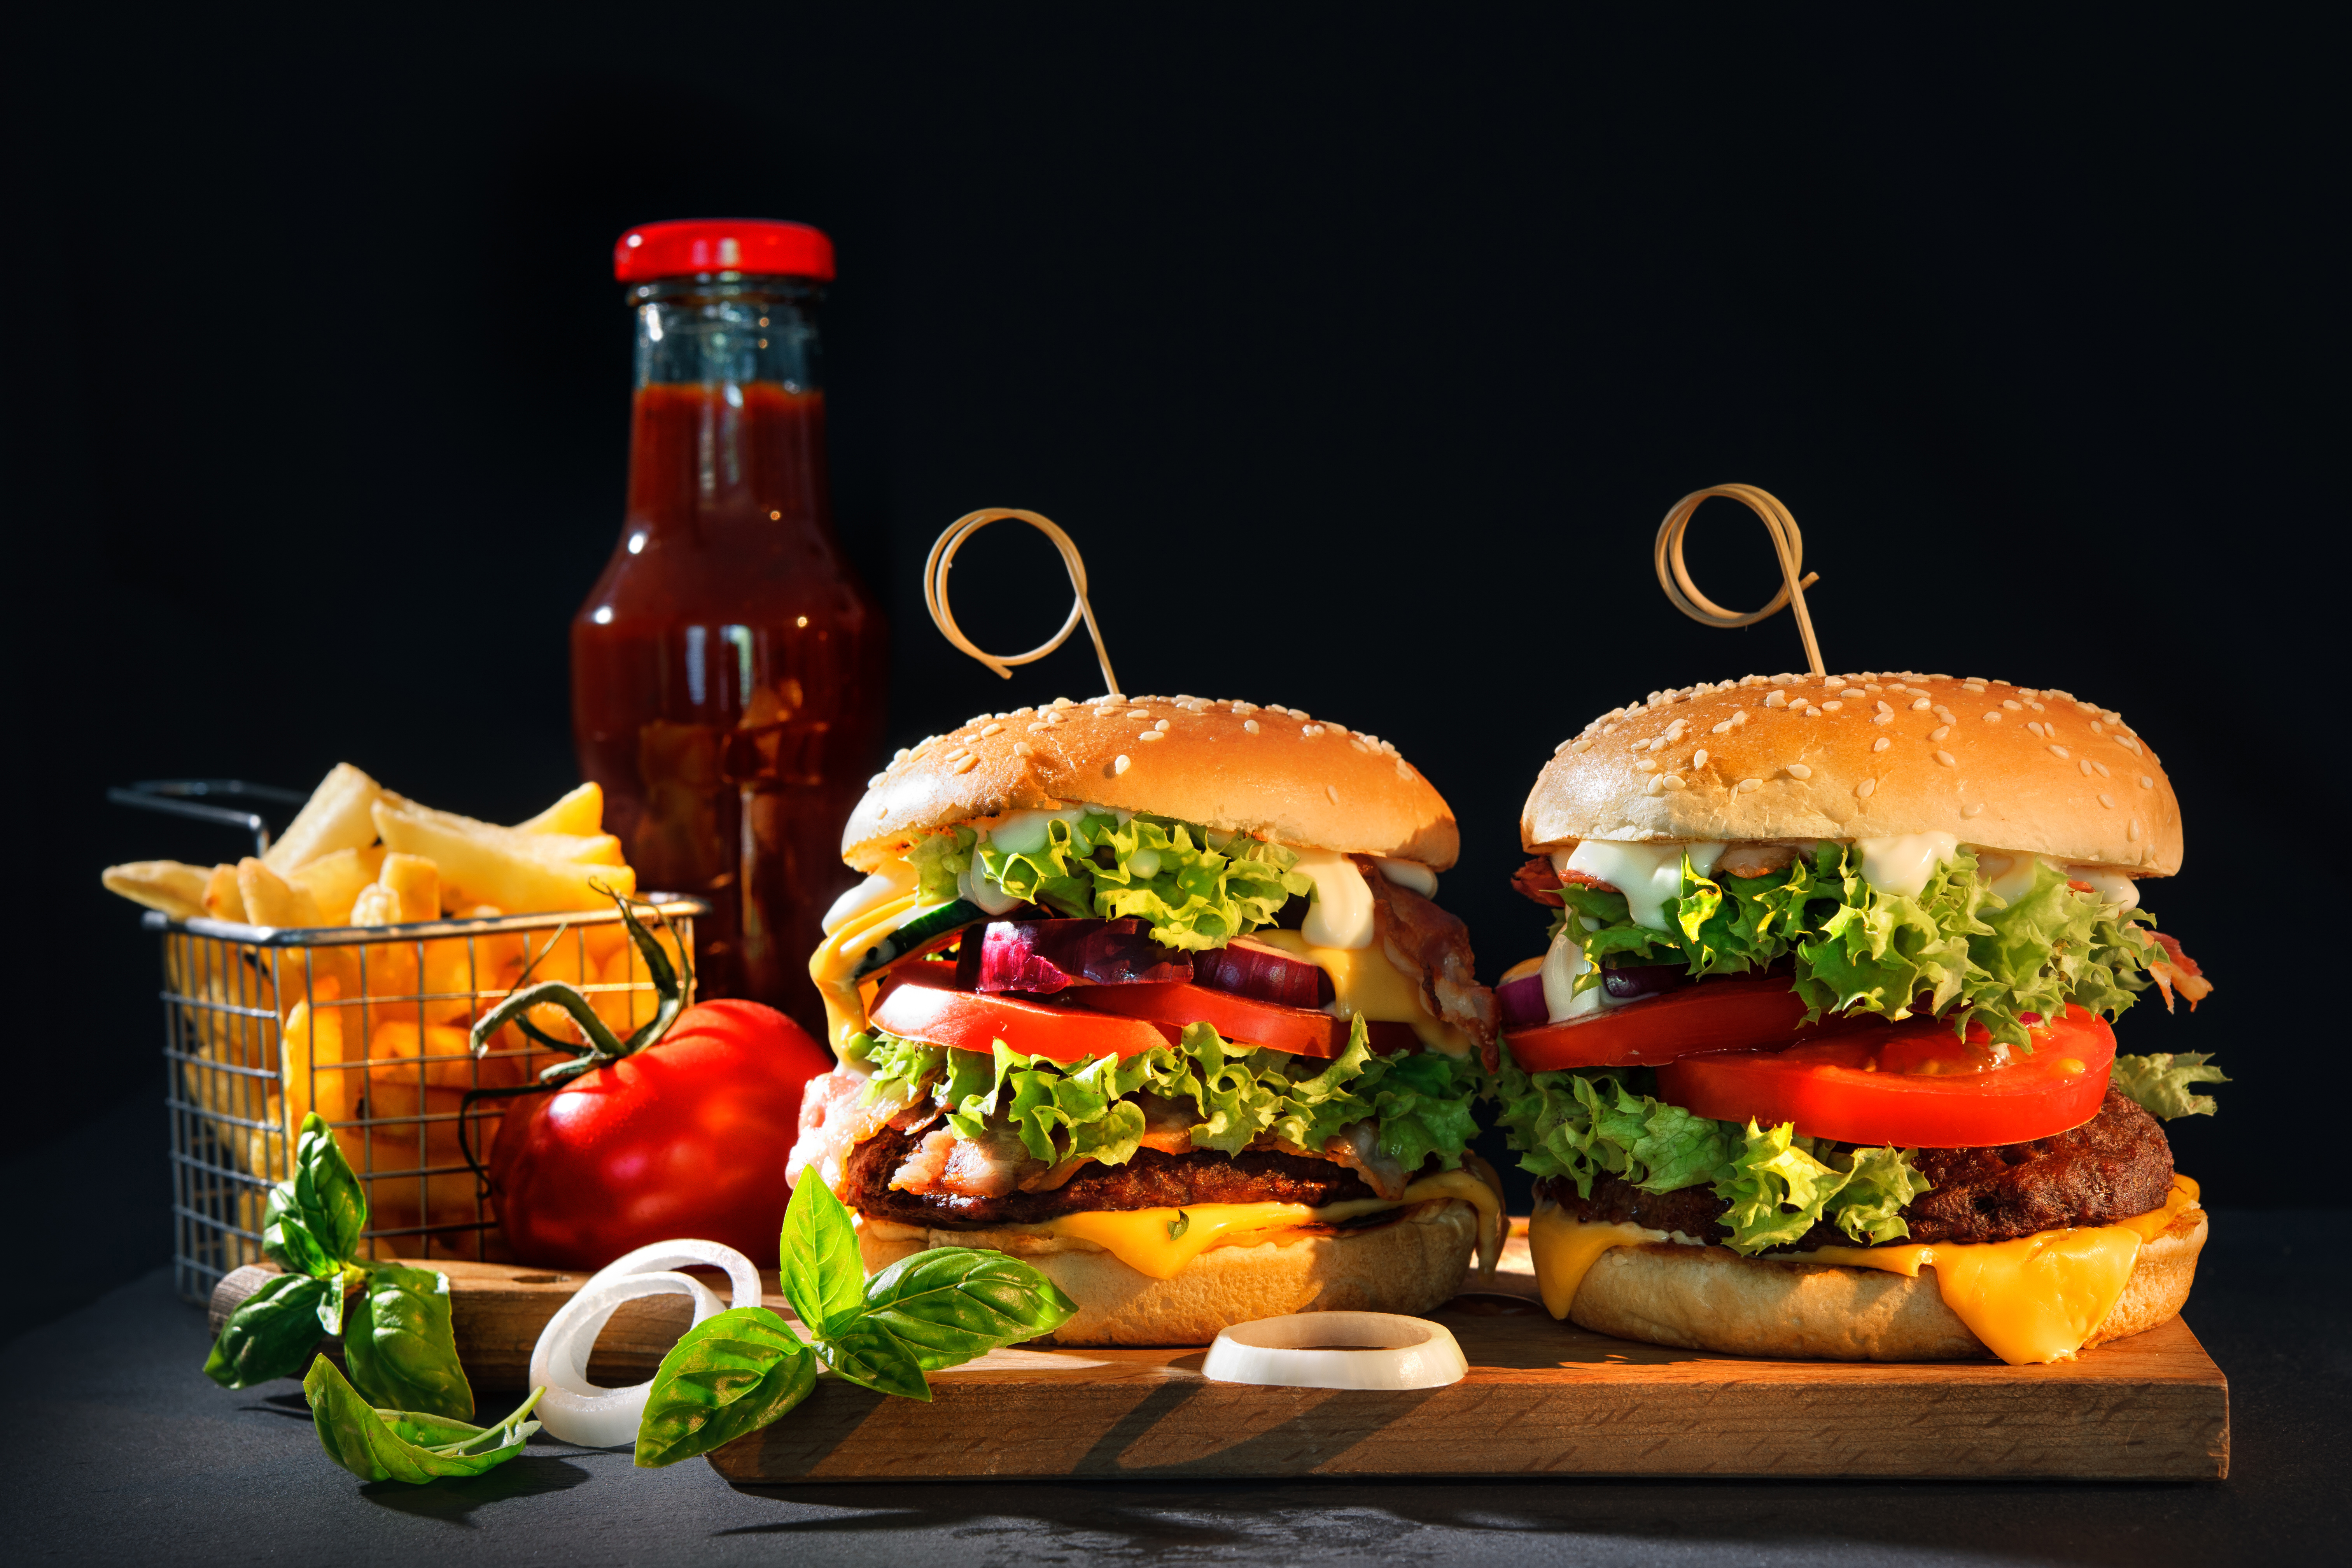 Amazing Wallpaper High Quality Burger - 870777  Image_911223.jpg